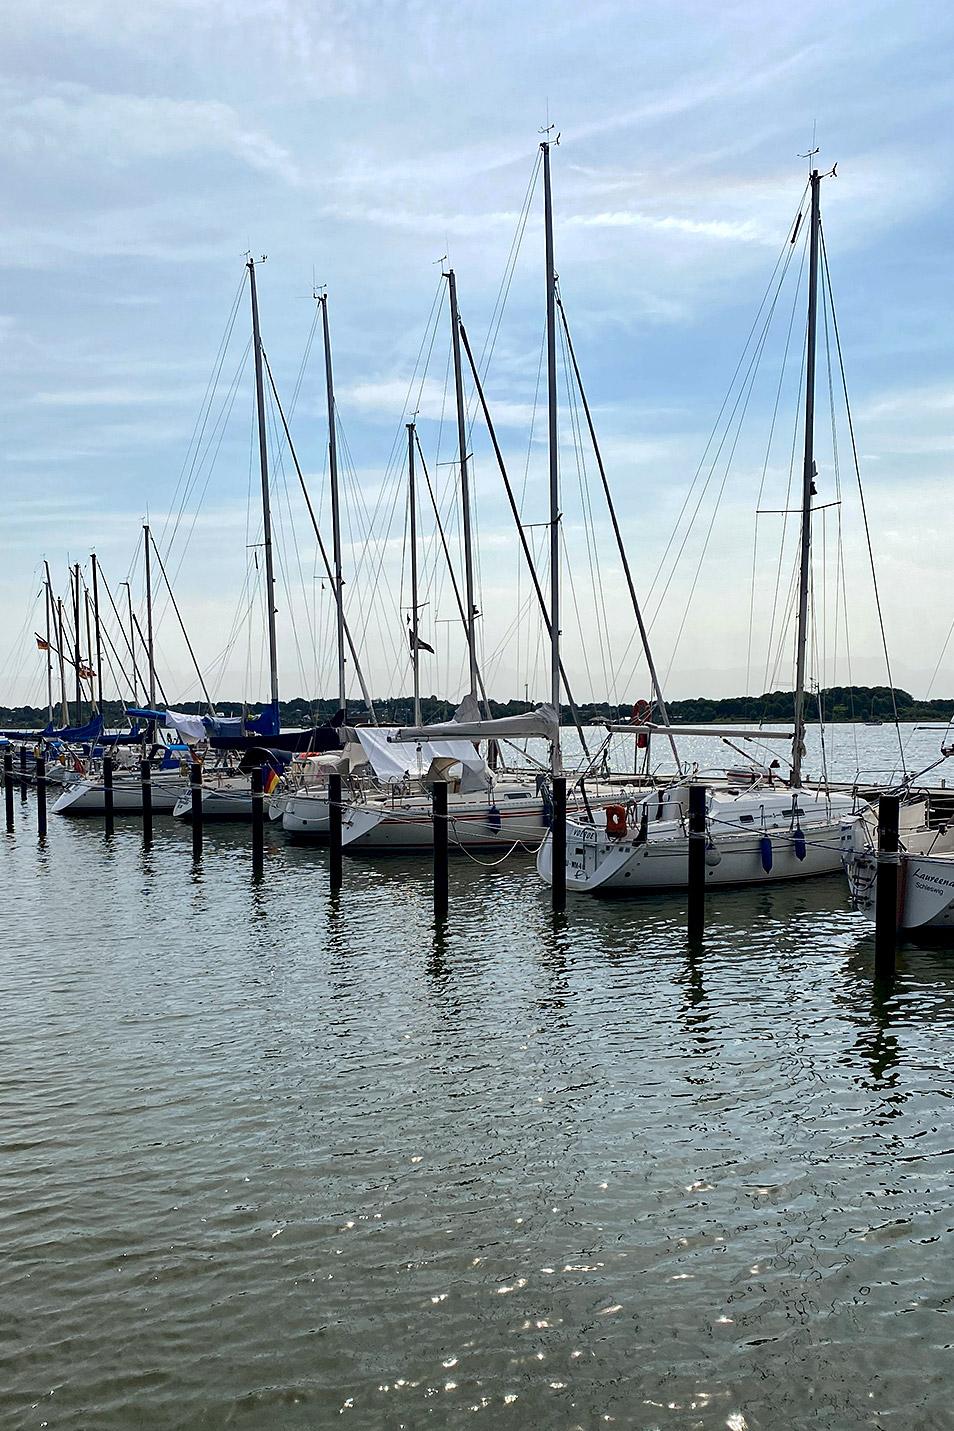 Hafen Schleswig Segelboote Relana Dombetzki ALDO Magazin